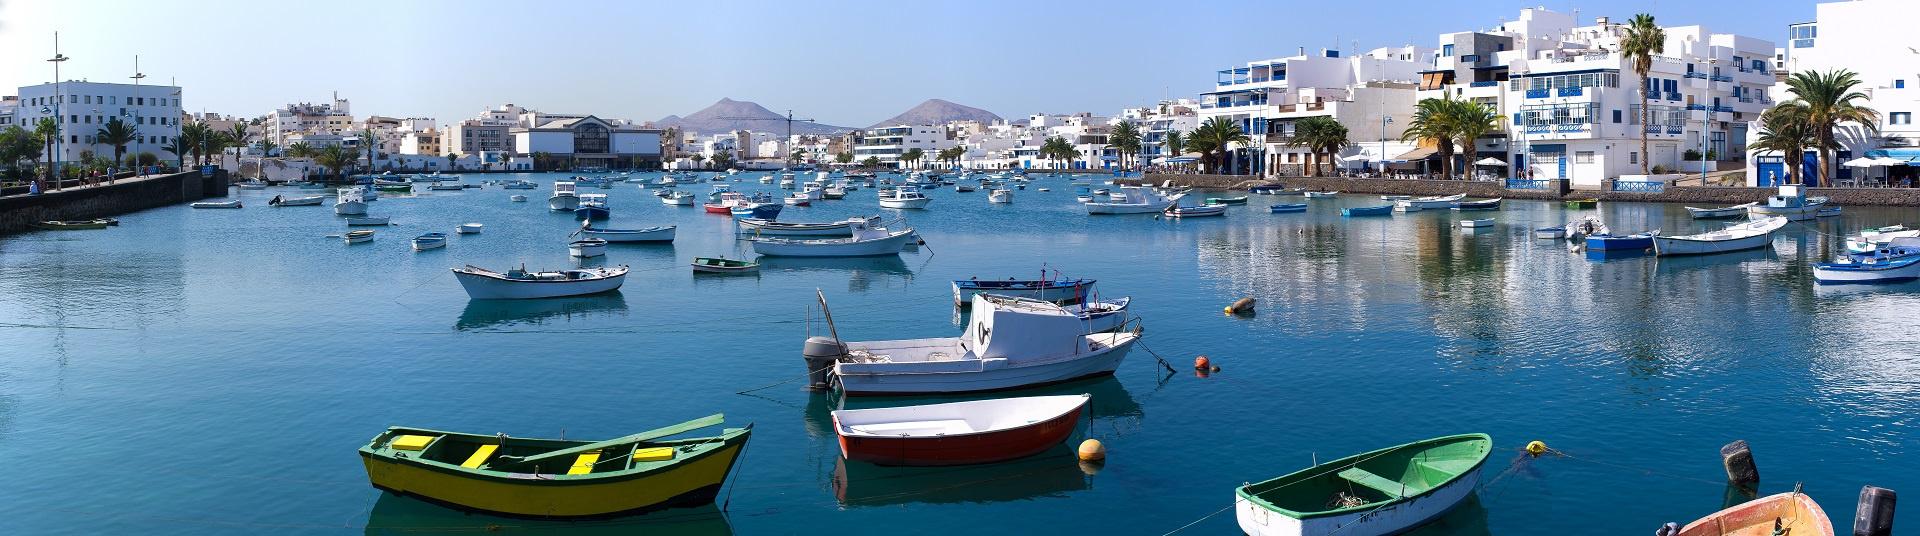 Week-end pas cher Lanzarote